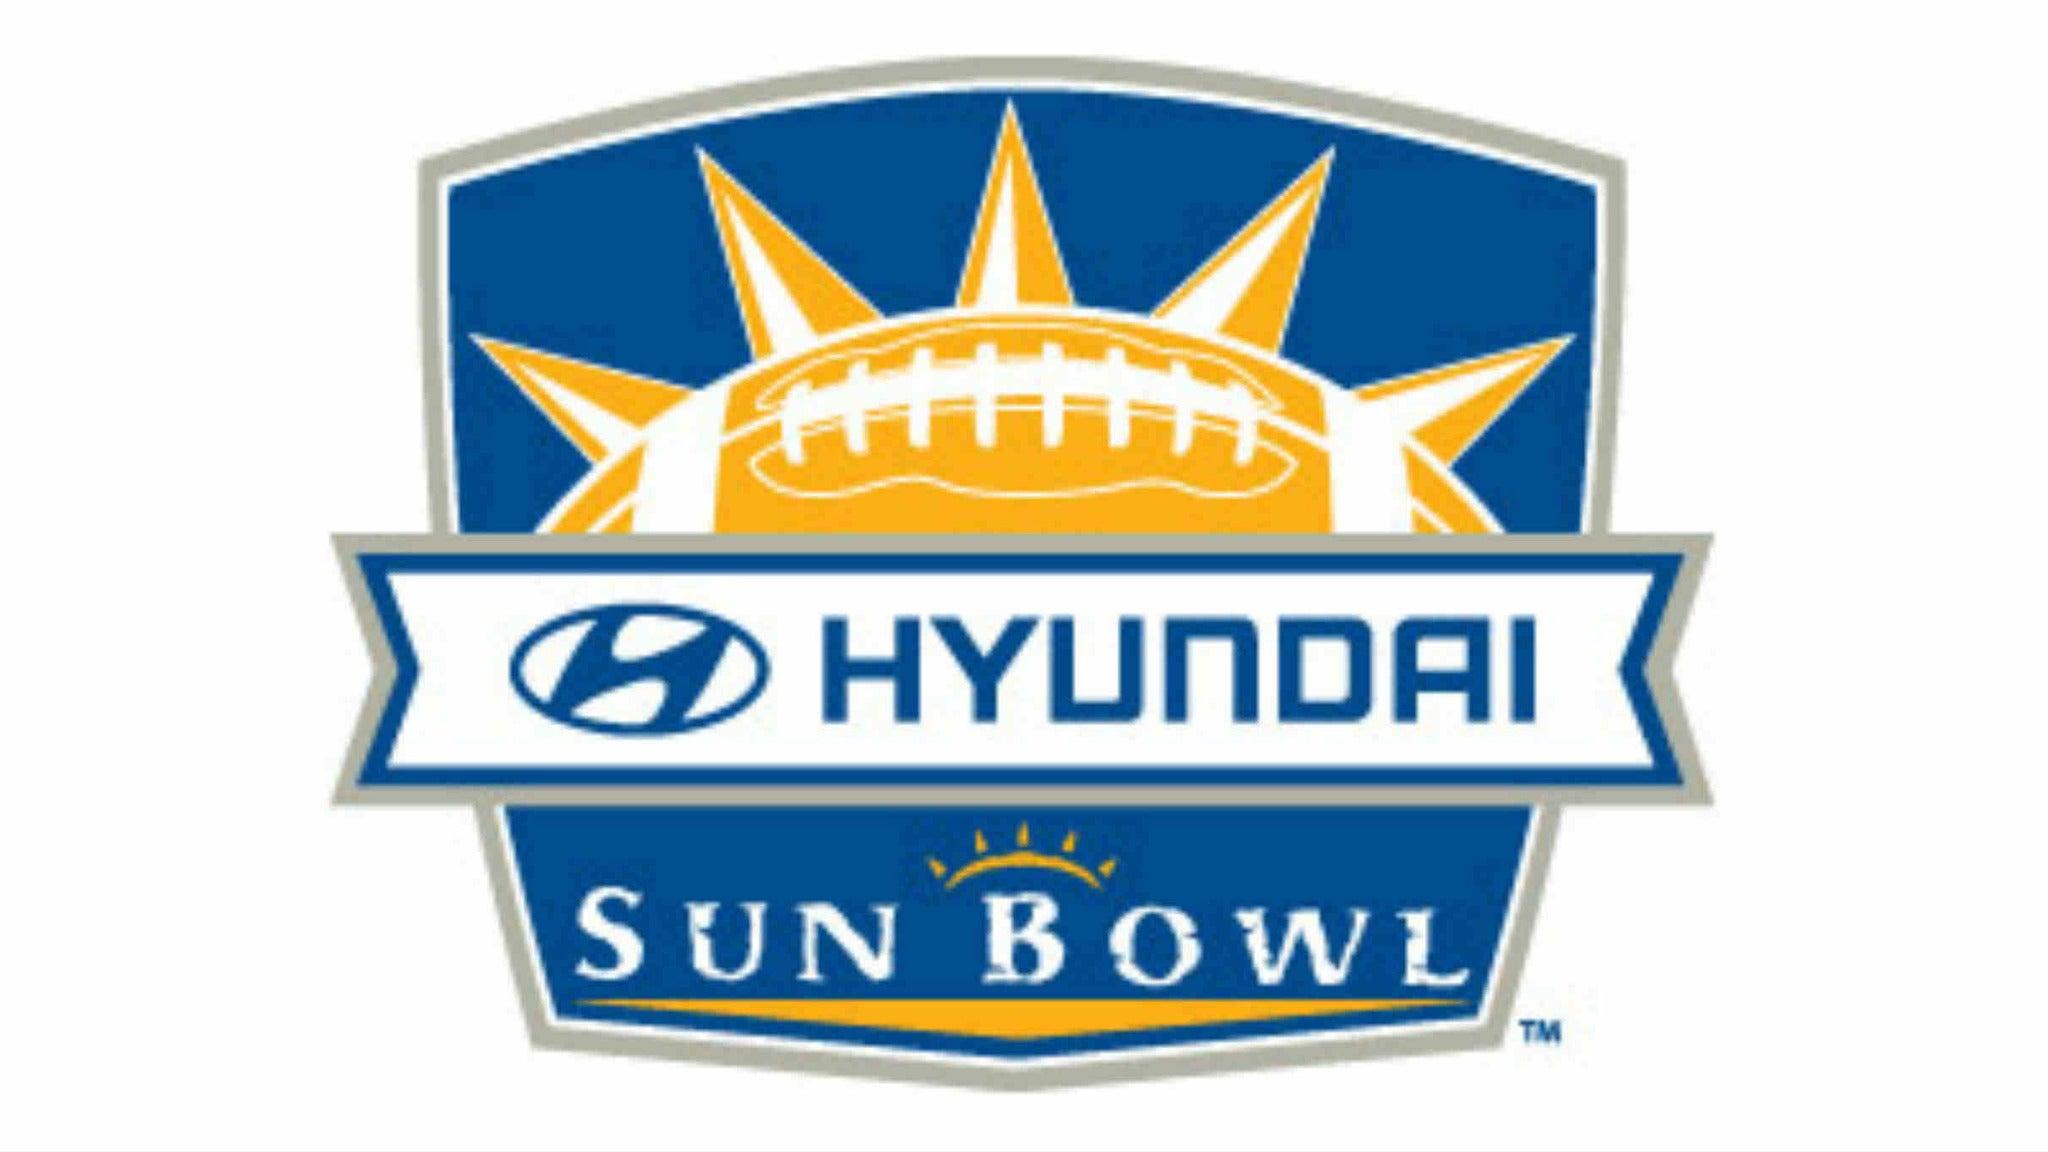 Hyundai Sun Bowl Football at Hyundai Sun Bowl - El Paso, TX 79902